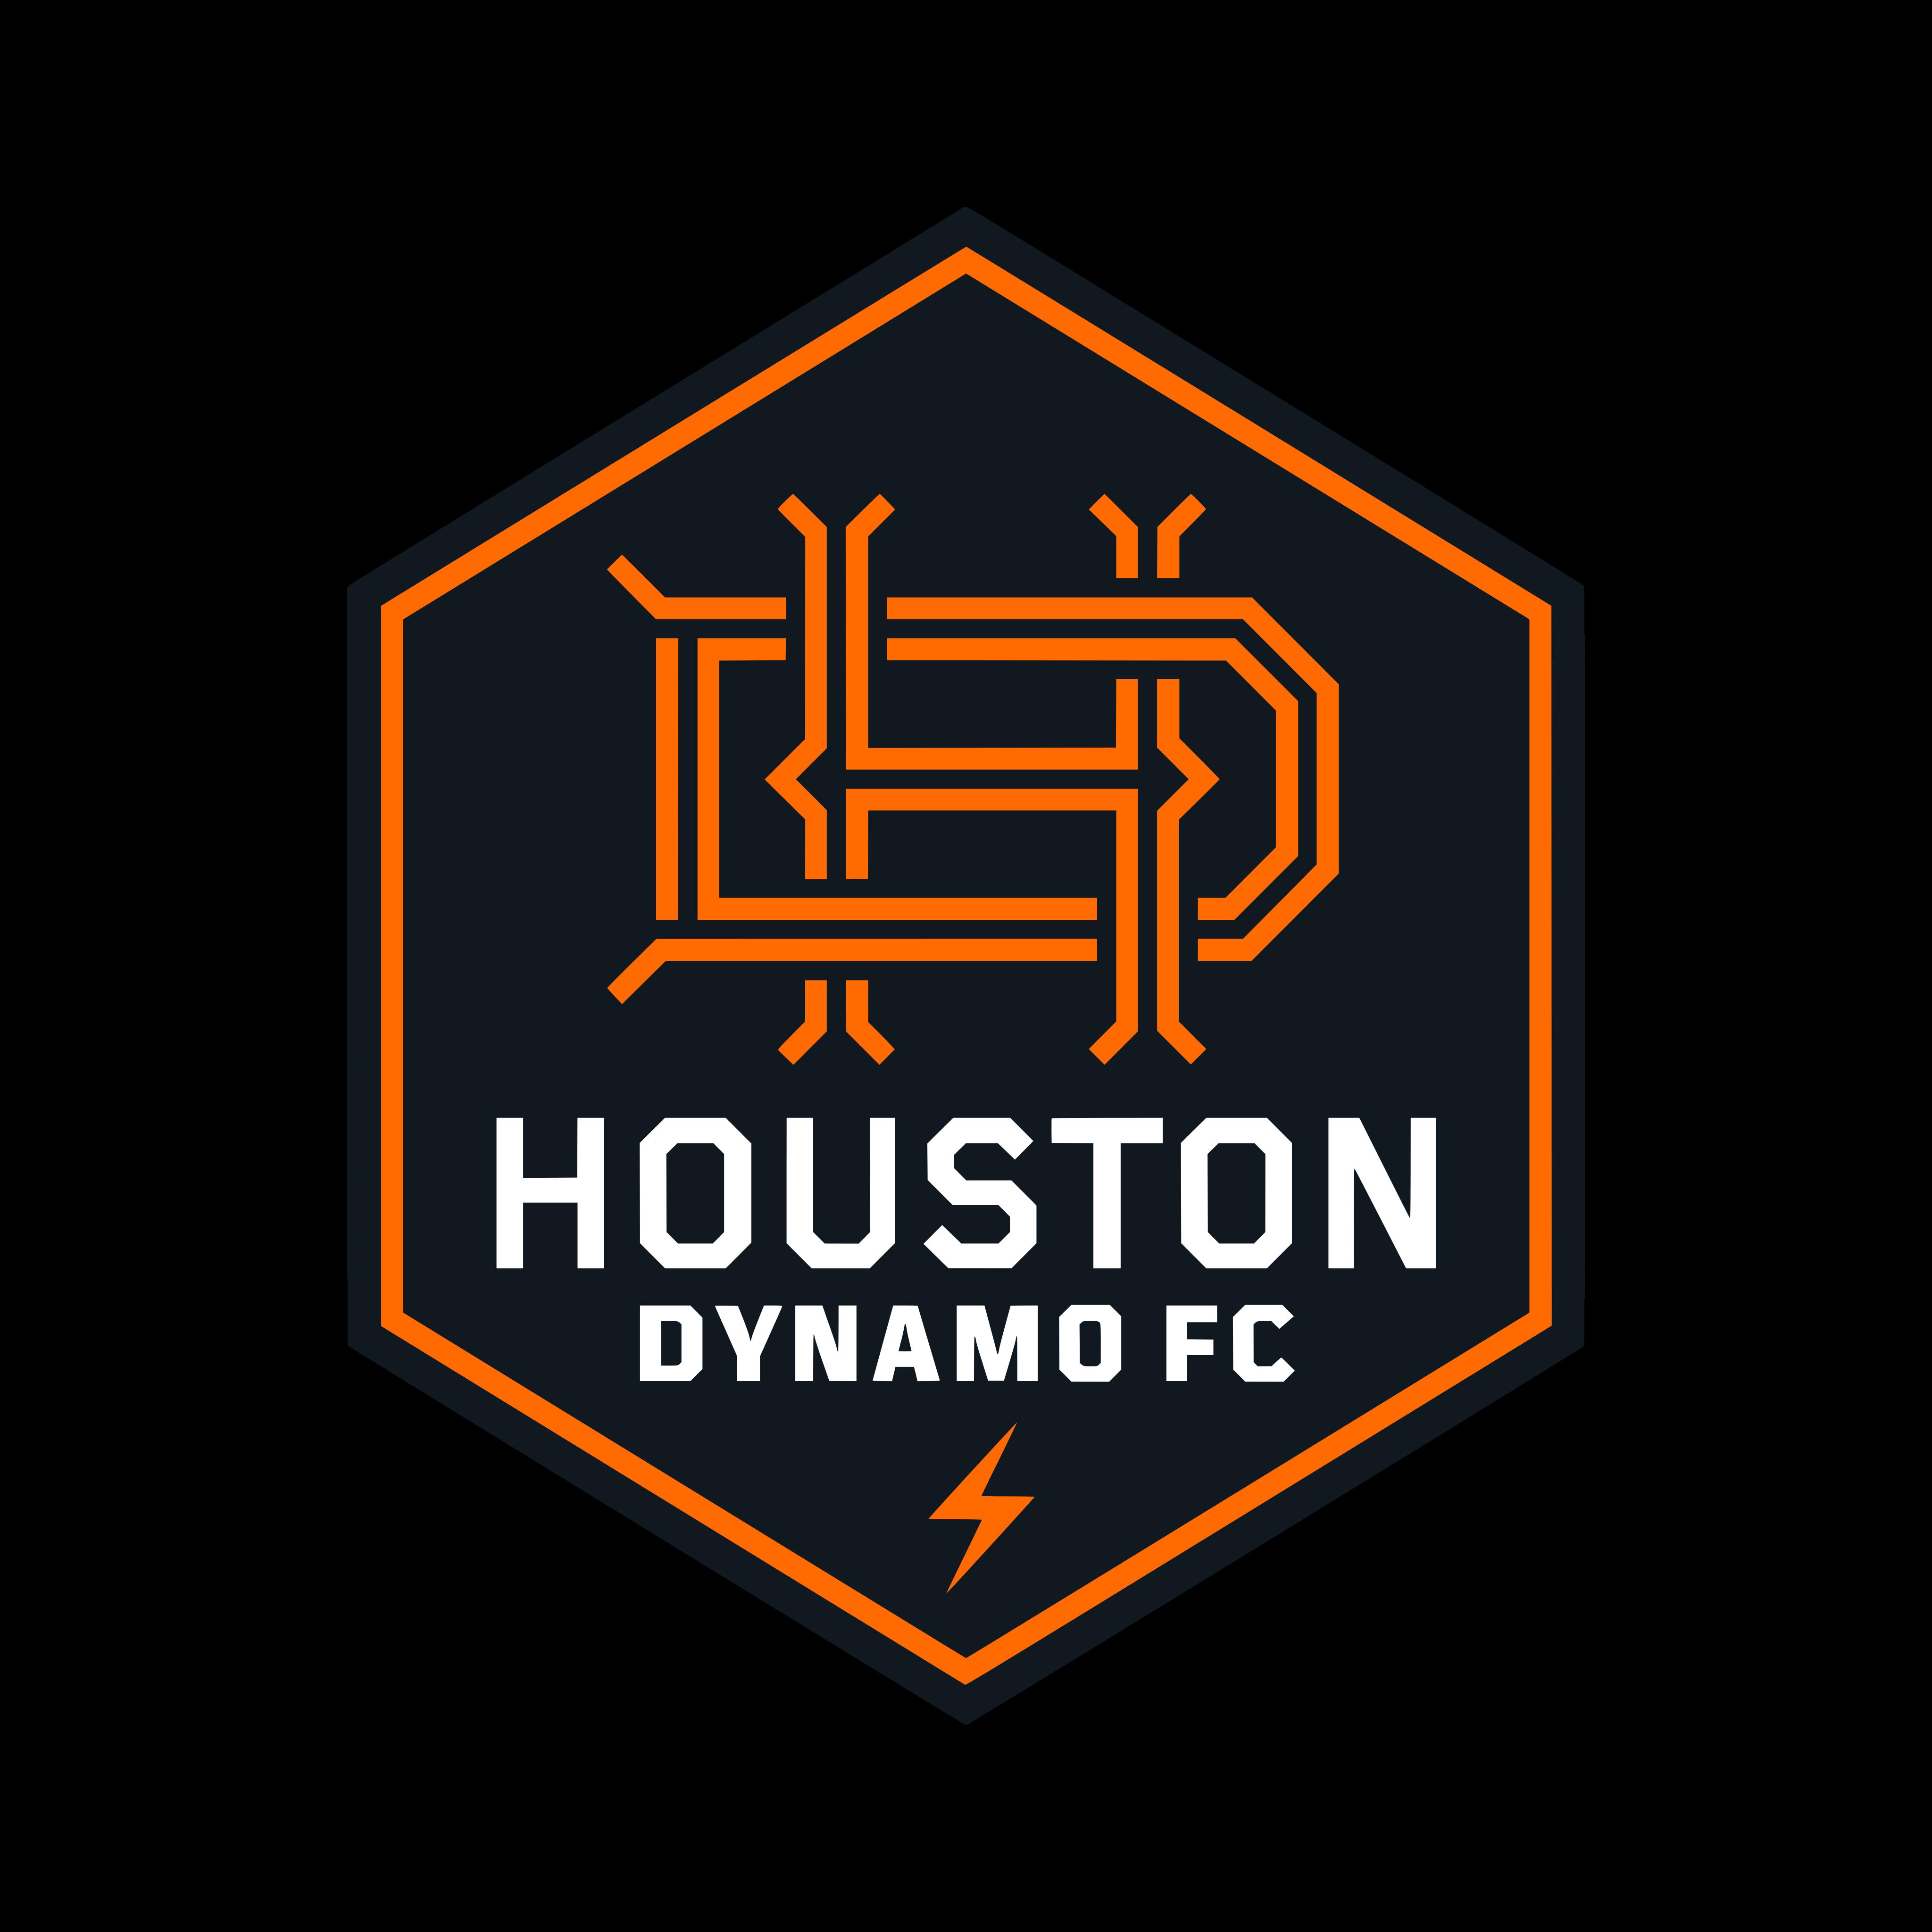 houston dynamo fc logo 0 - Houston Dynamo Logo